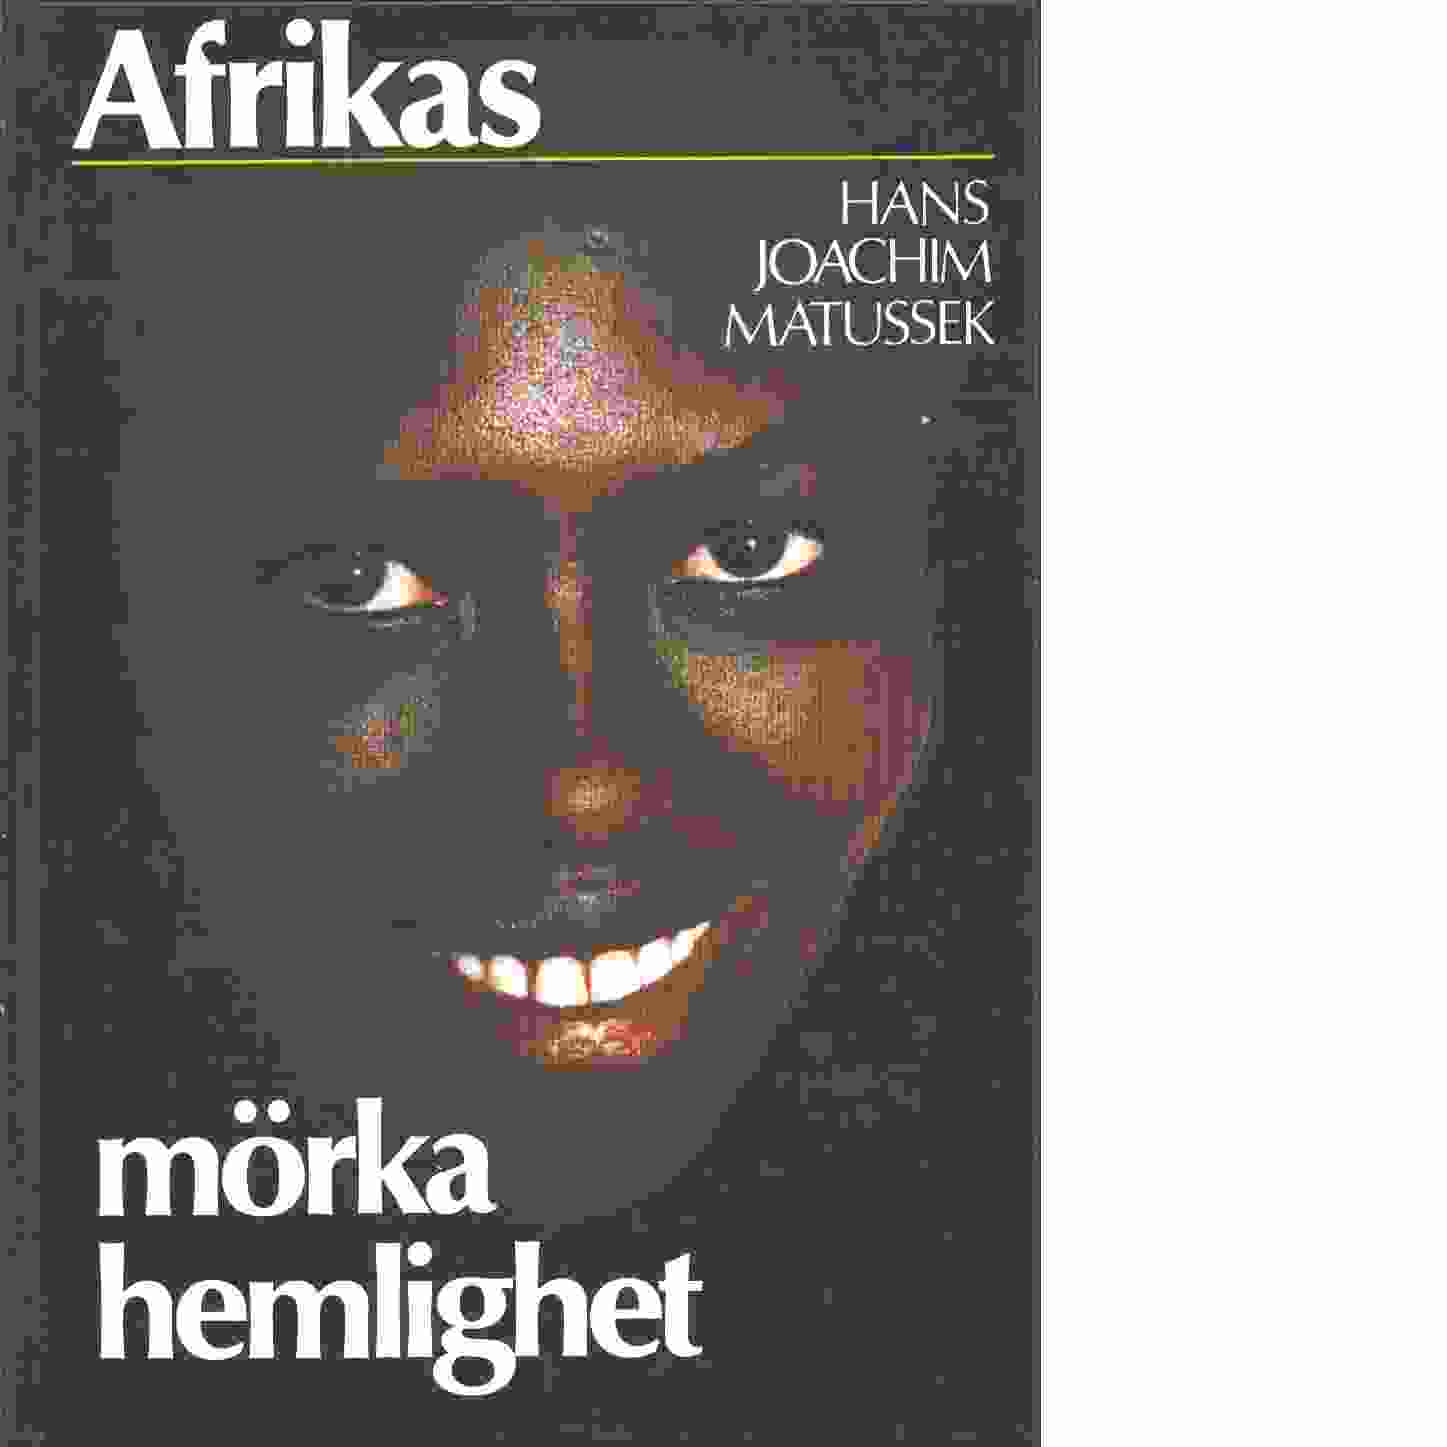 Afrikas mörka hemlighet  - Matussek, Hans Joachim